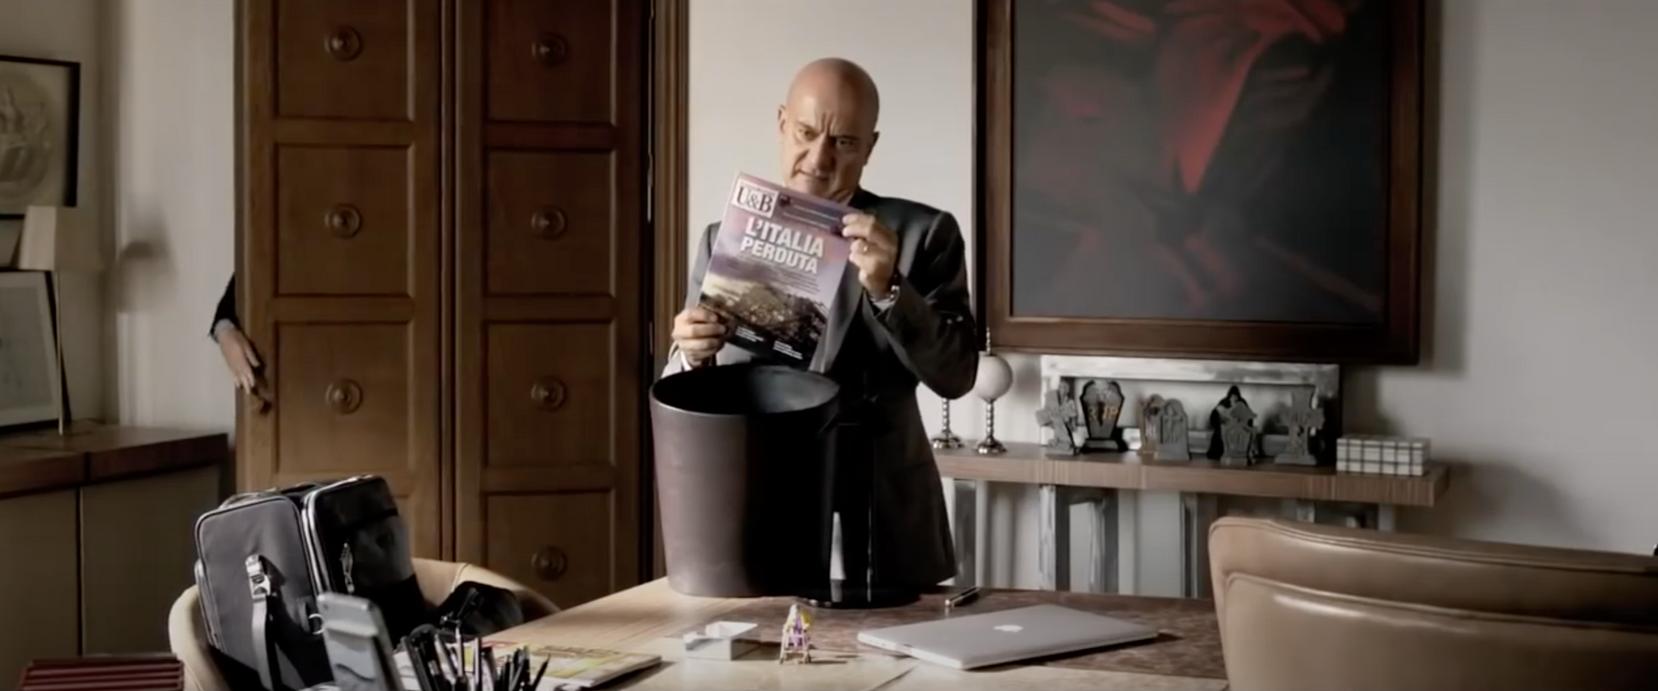 La gente che sta bene 2013  directed by Francesco Patierno production designed by Tonino Zera